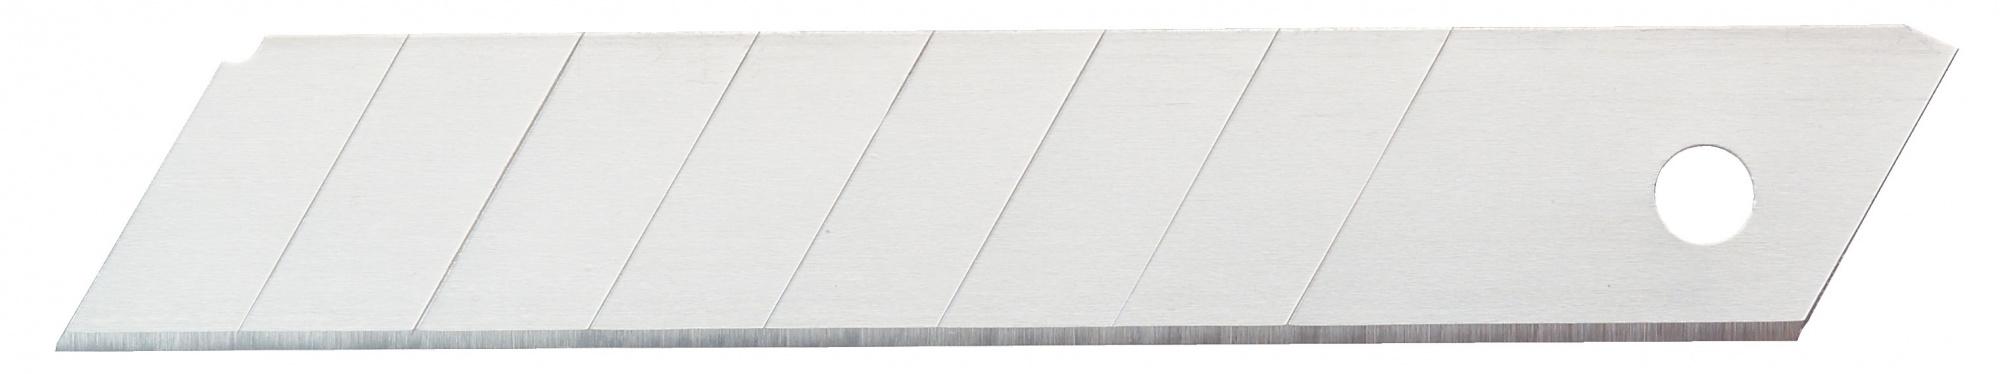 Irwin (10504567) - лезвие с отламывающимися сегментами 9 мм